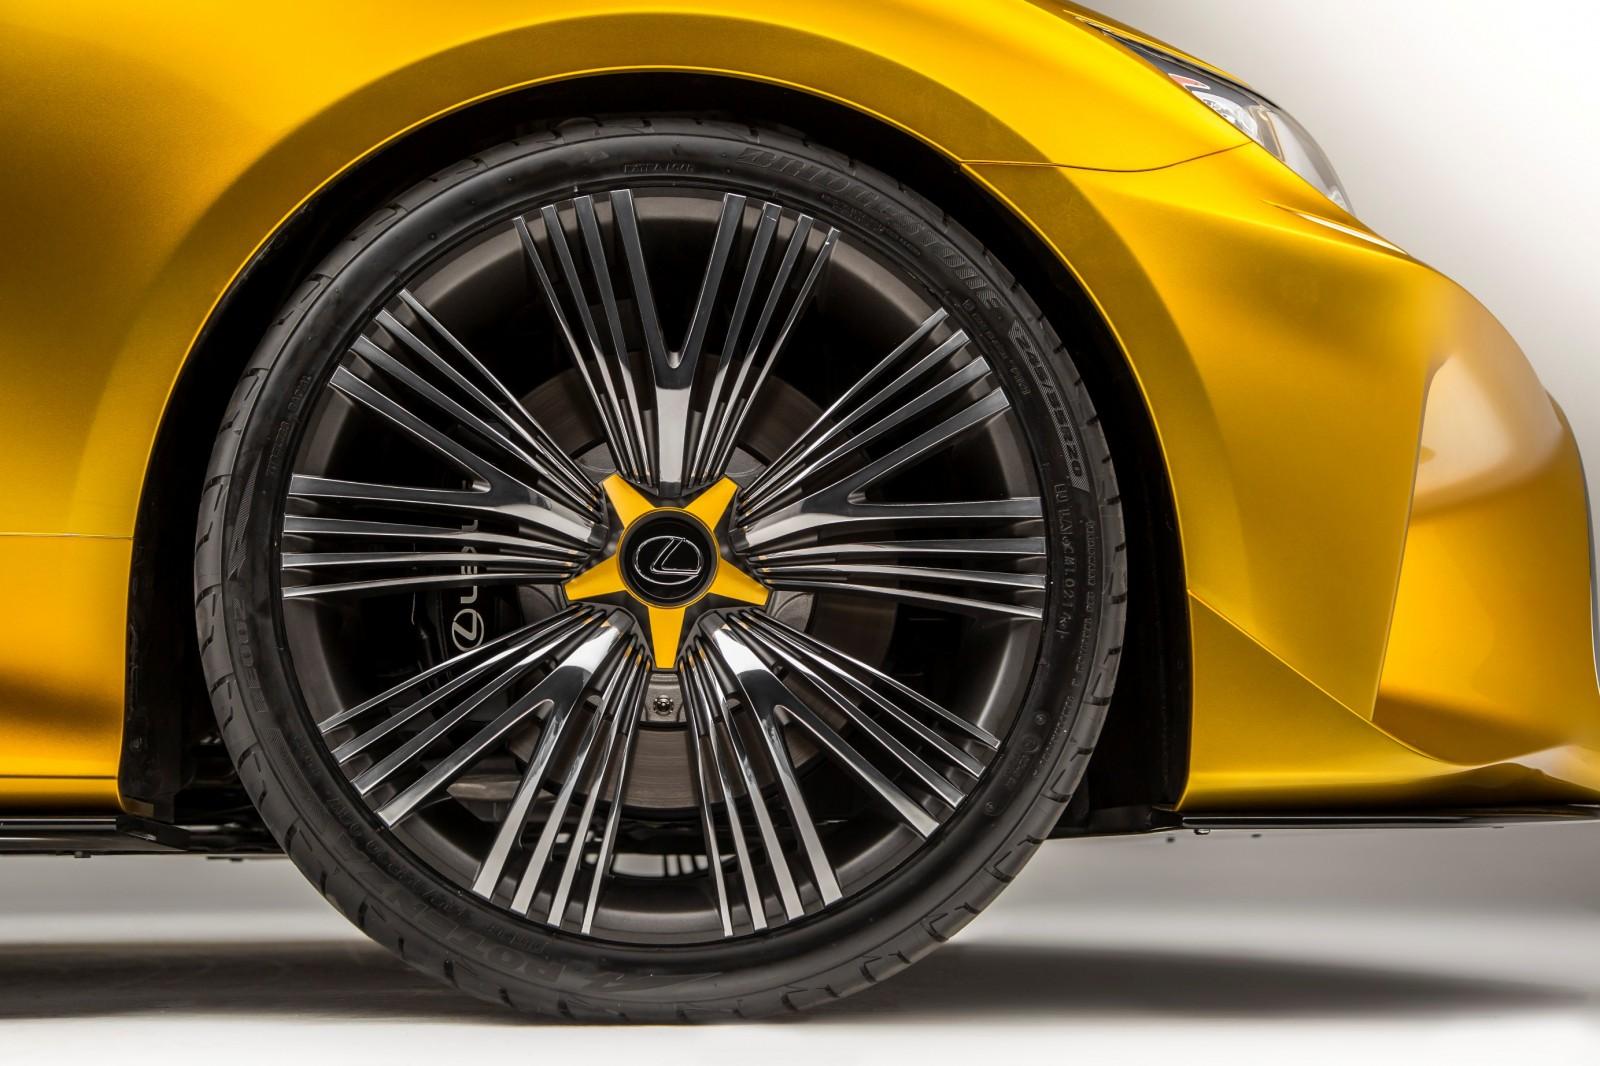 http://www.car-revs-daily.com/wp-content/uploads/2014/11/2014-Lexus-LFC2-Concept-29-1600x1066.jpg